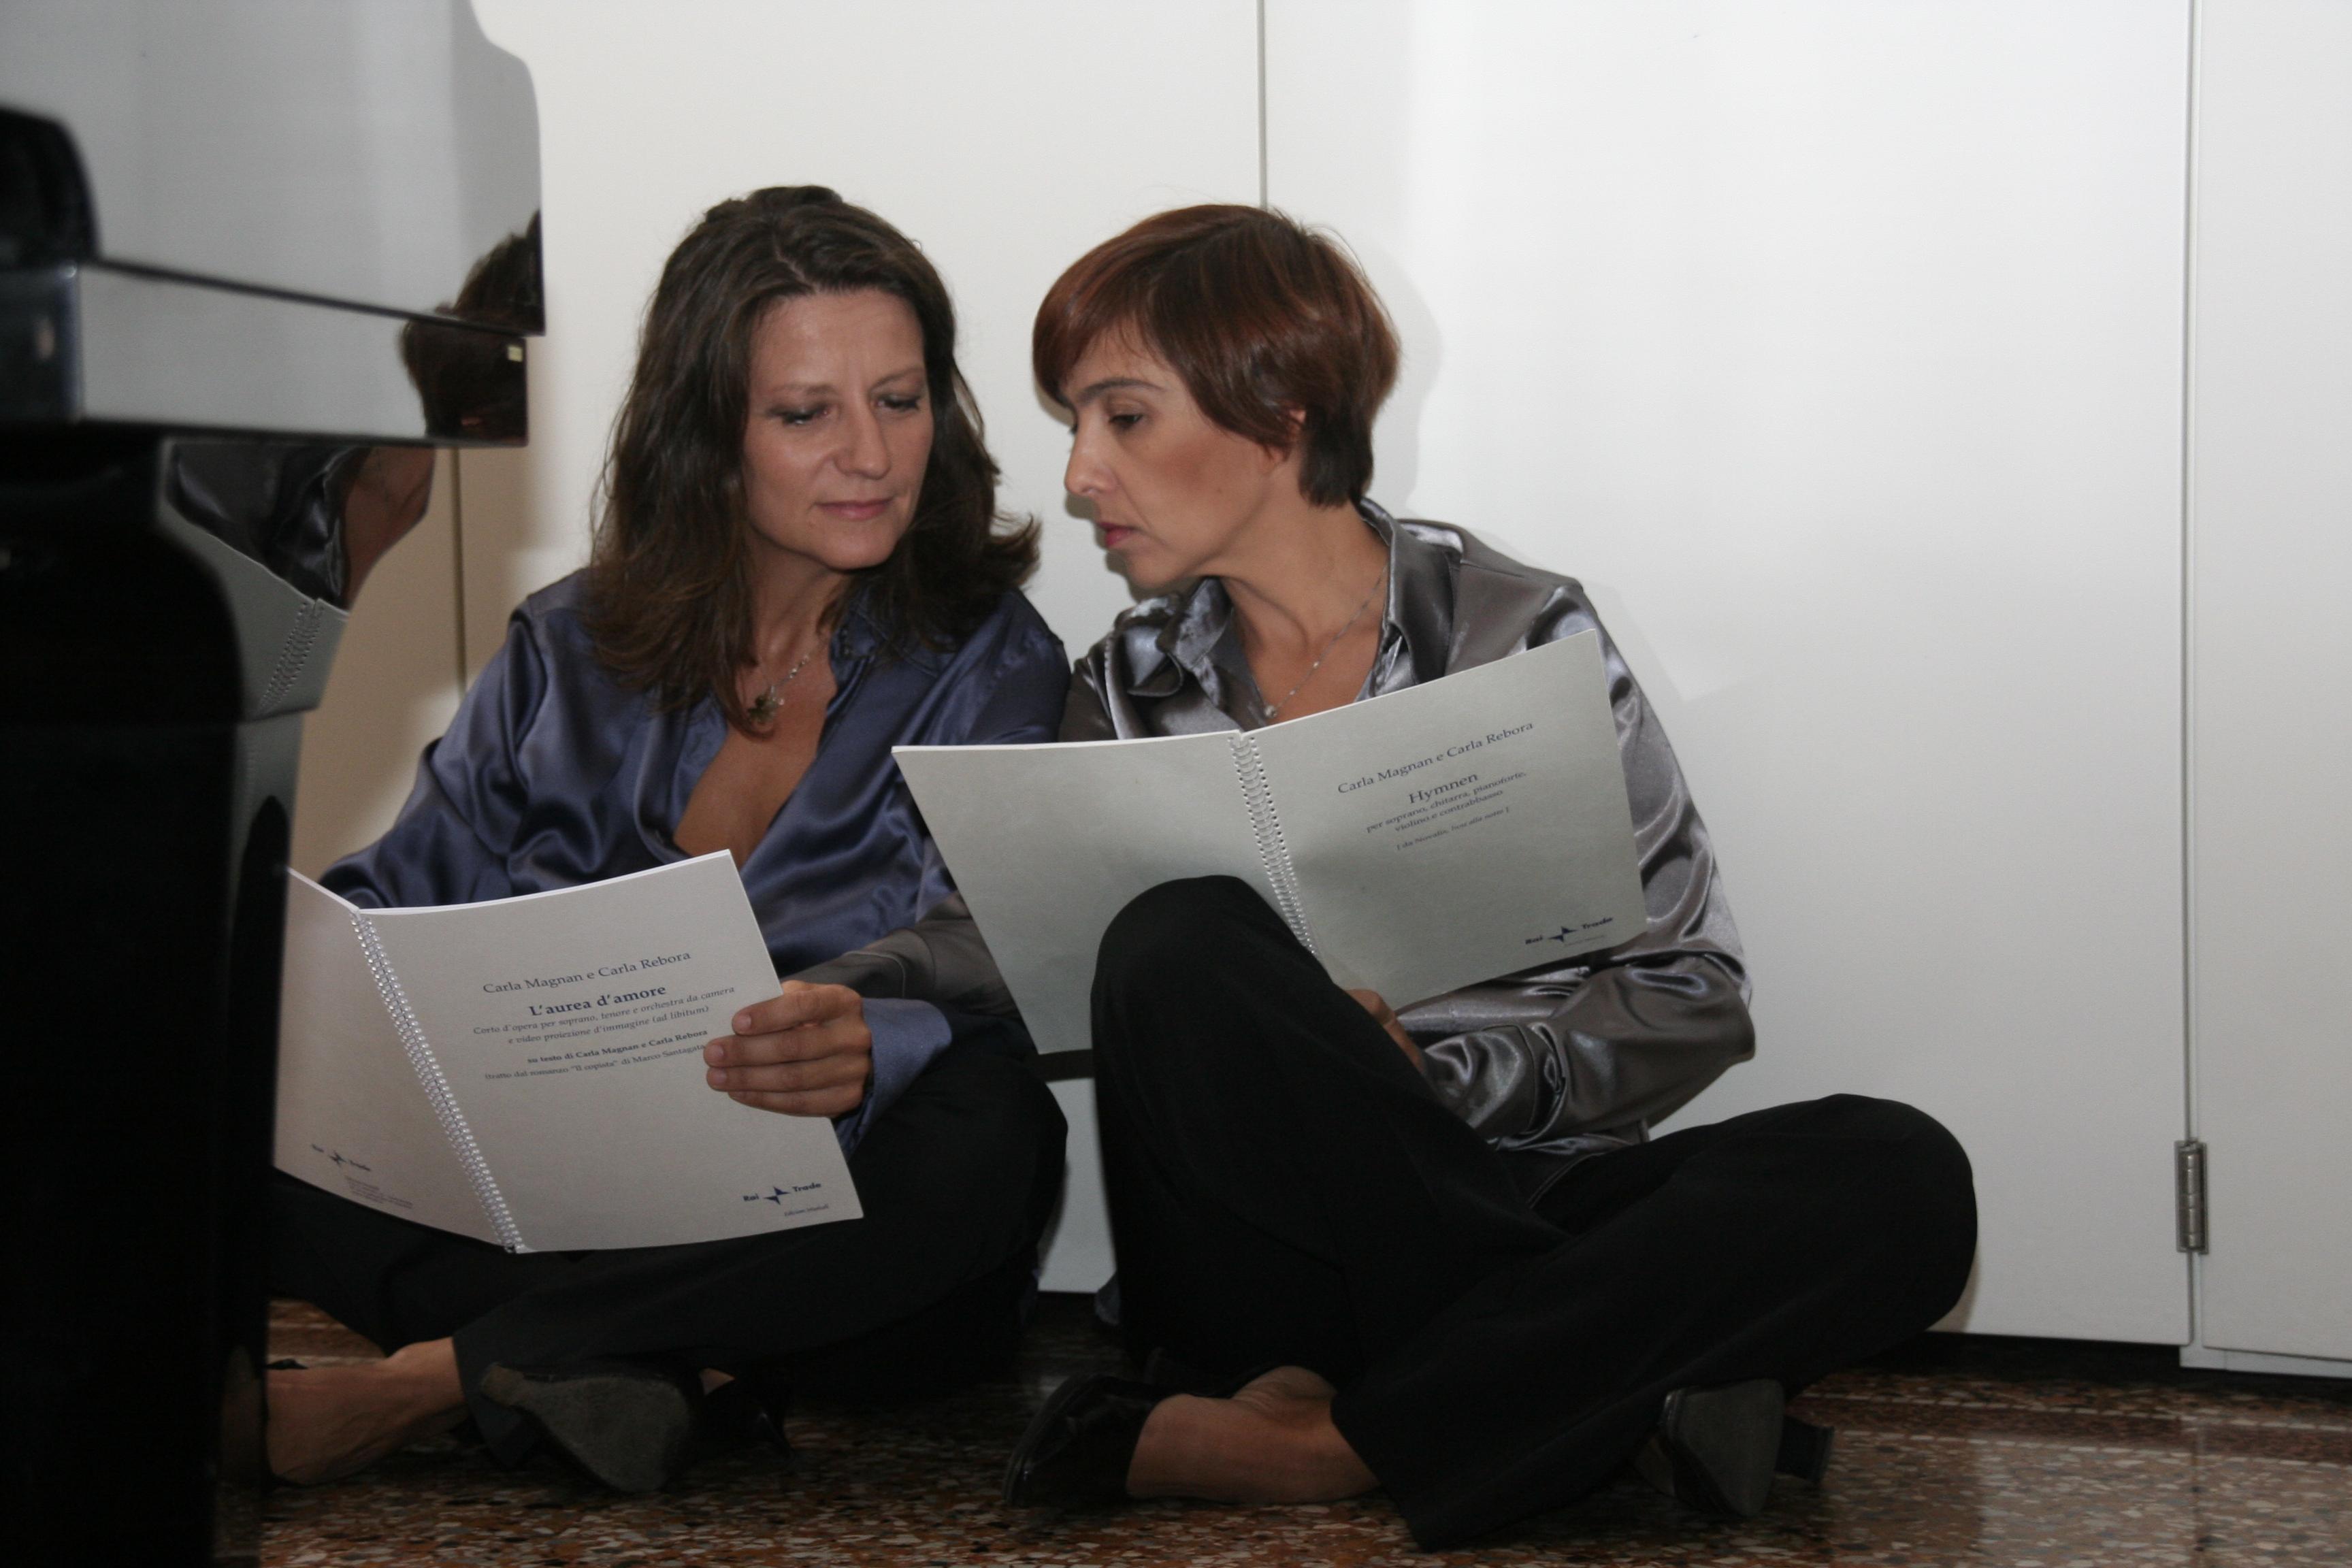 Carla&Carla